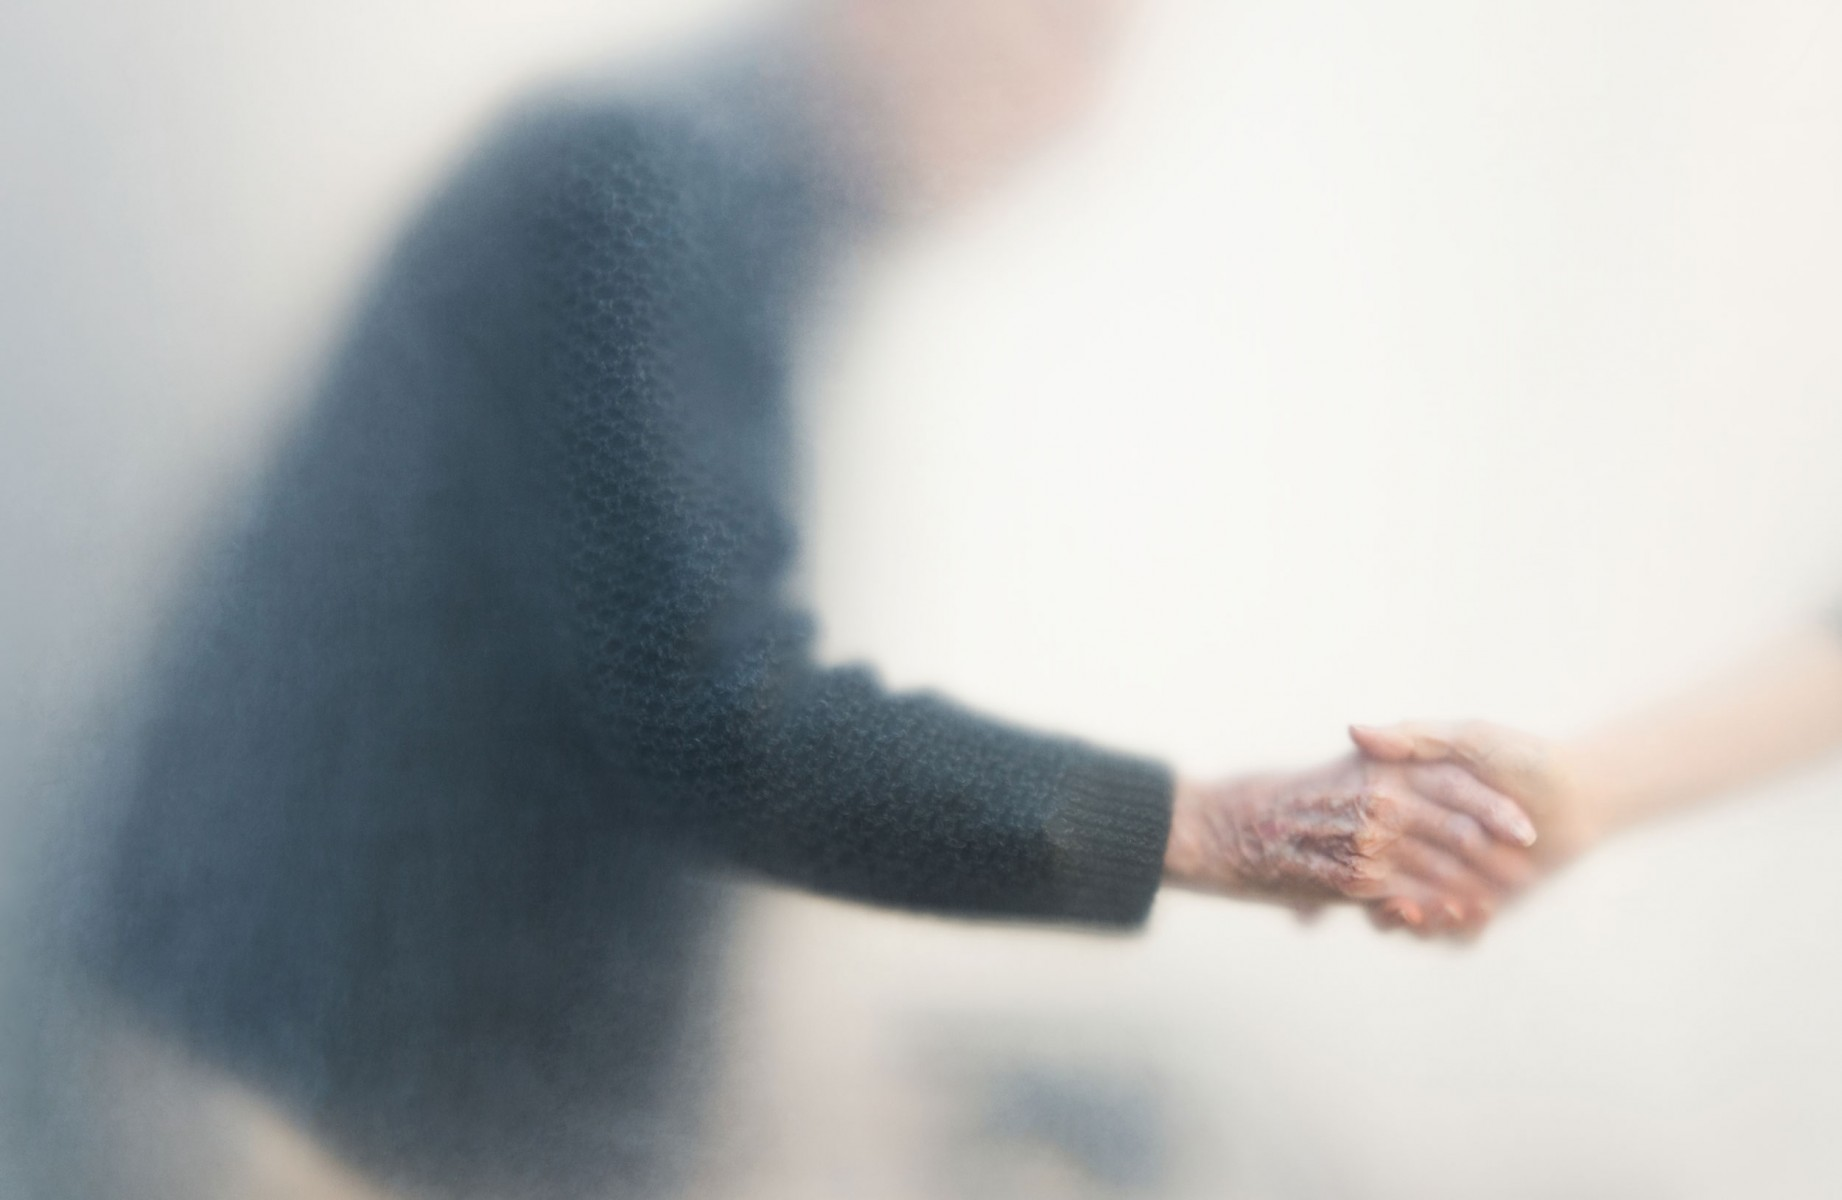 An older gentleman grabbing someone's hand